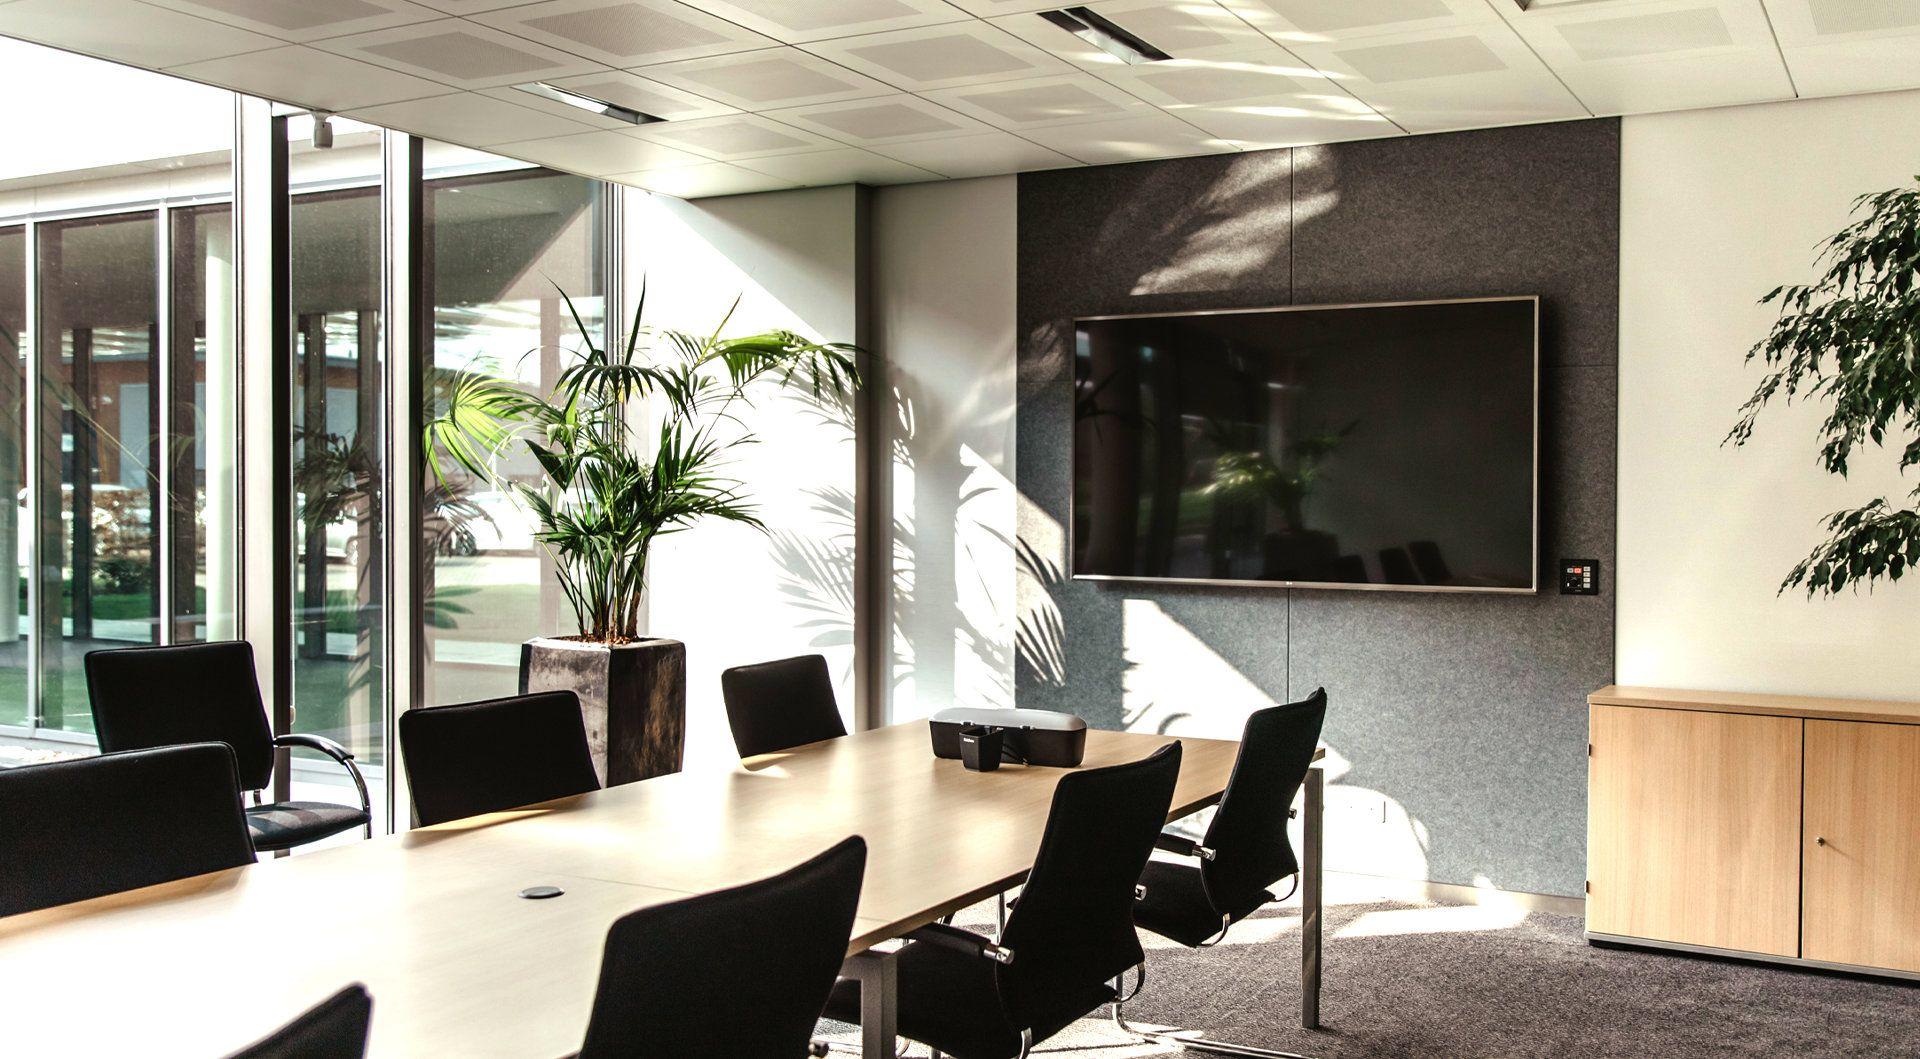 "Chief RMT2 flat panel muur steun 106,7 cm (42"") Zwart - Case studie de vries"